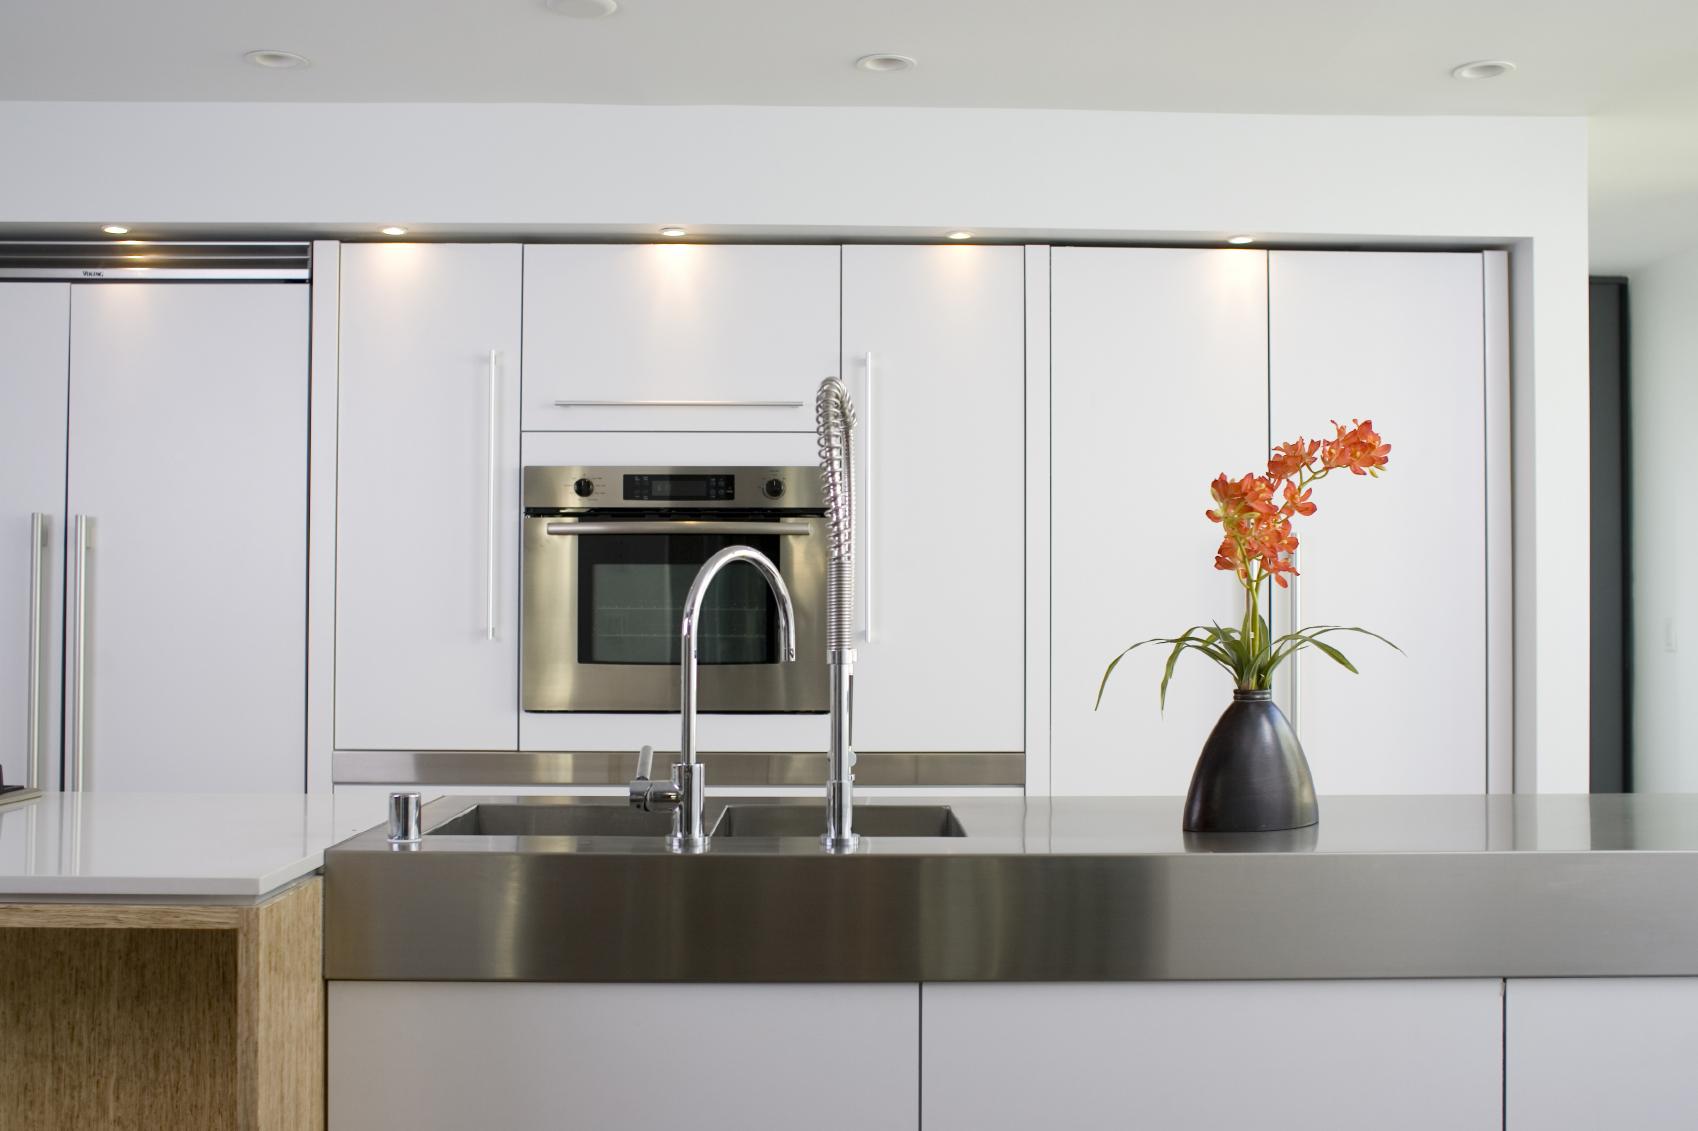 Custom Stainless modern Kitchen